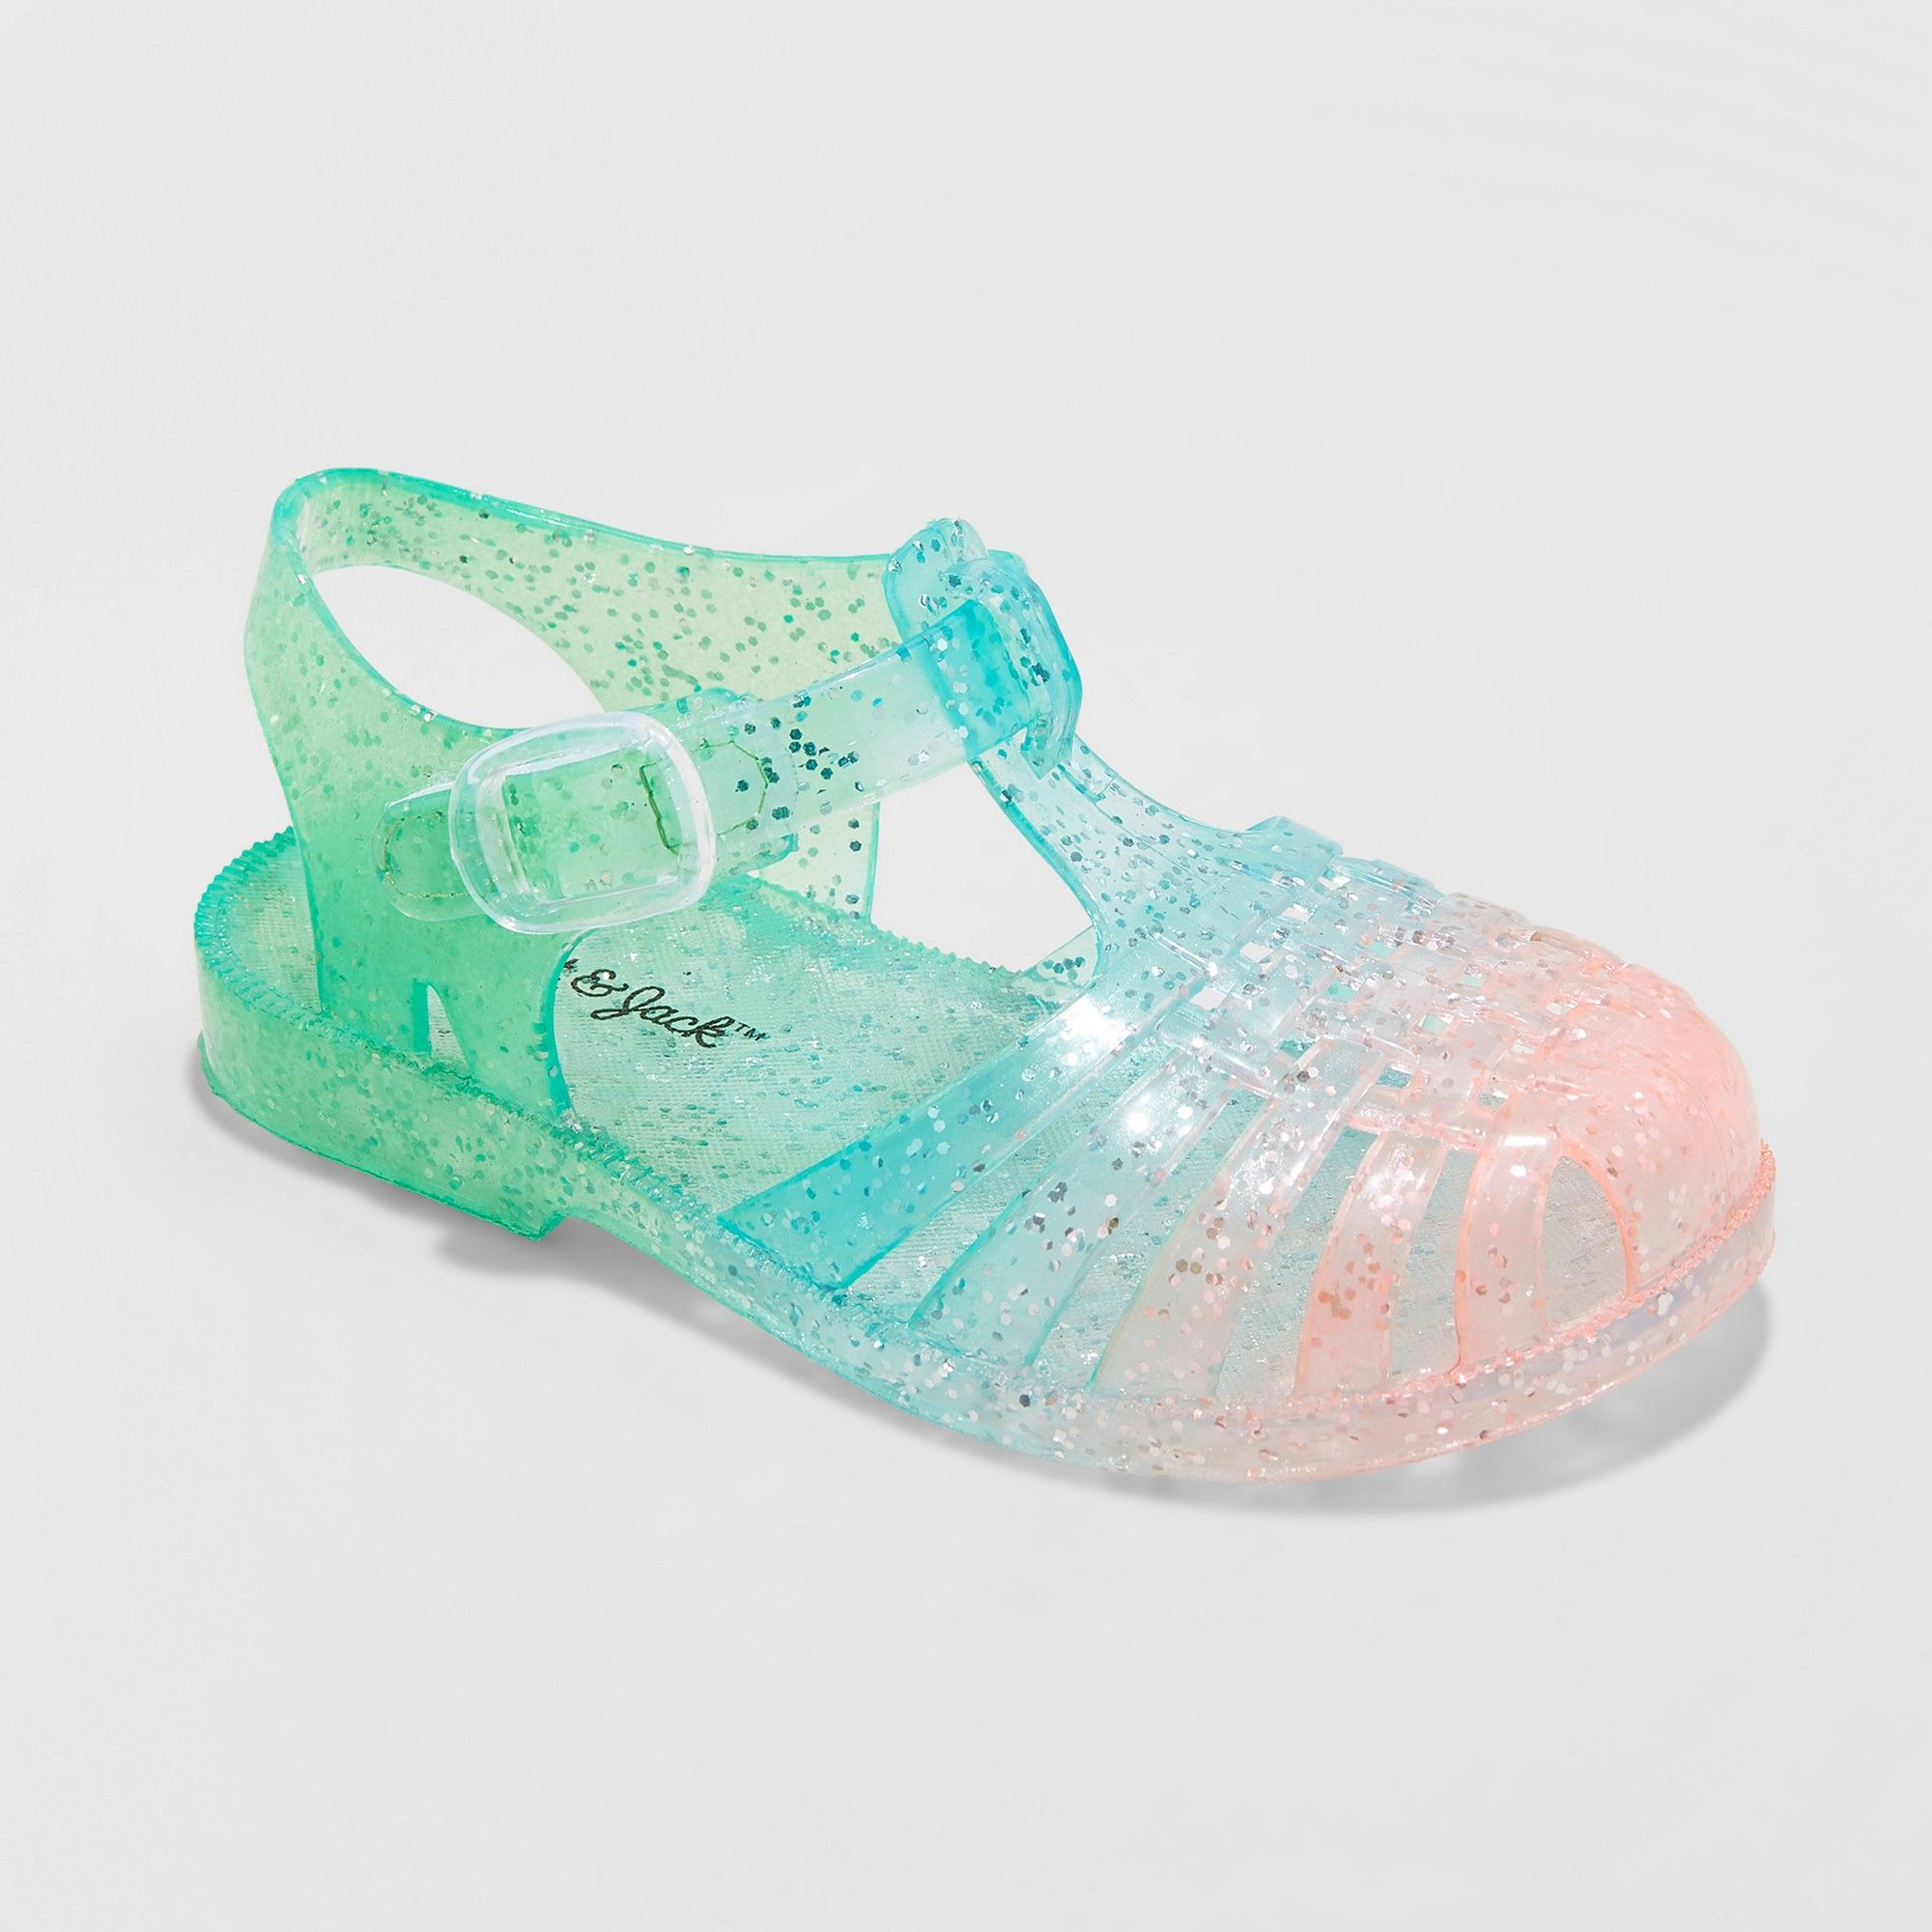 1431fb890f8e Toddler Girls  Fleur Jelly Fisherman Sandals - Cat   Jack Green 11 ...